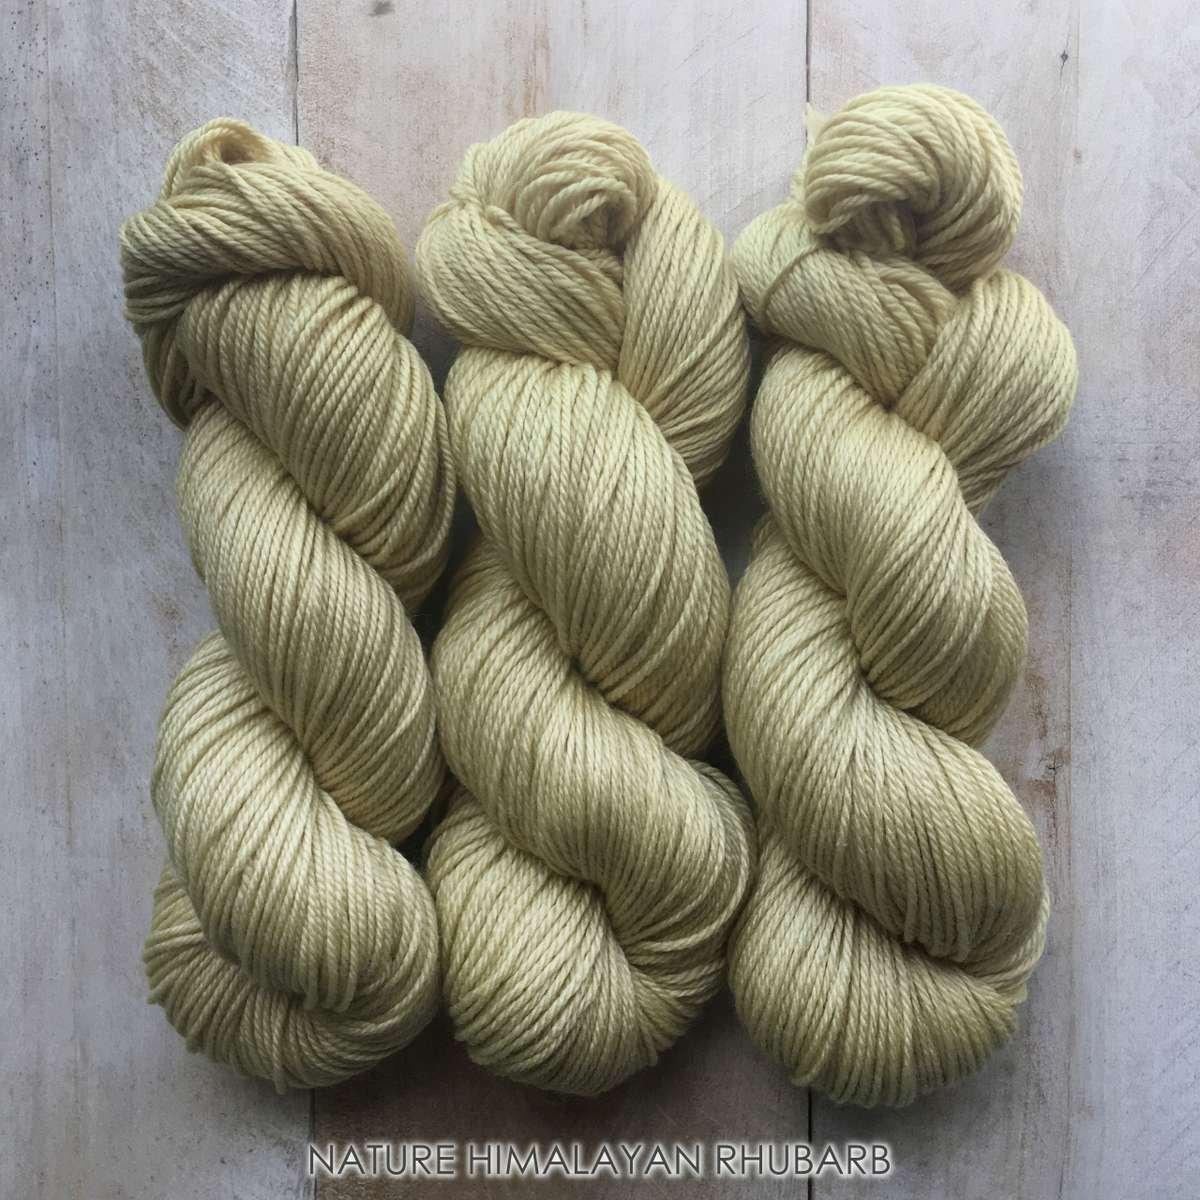 Hand-dyed yarn Louise Robert NATURE Himalayan rhubarb